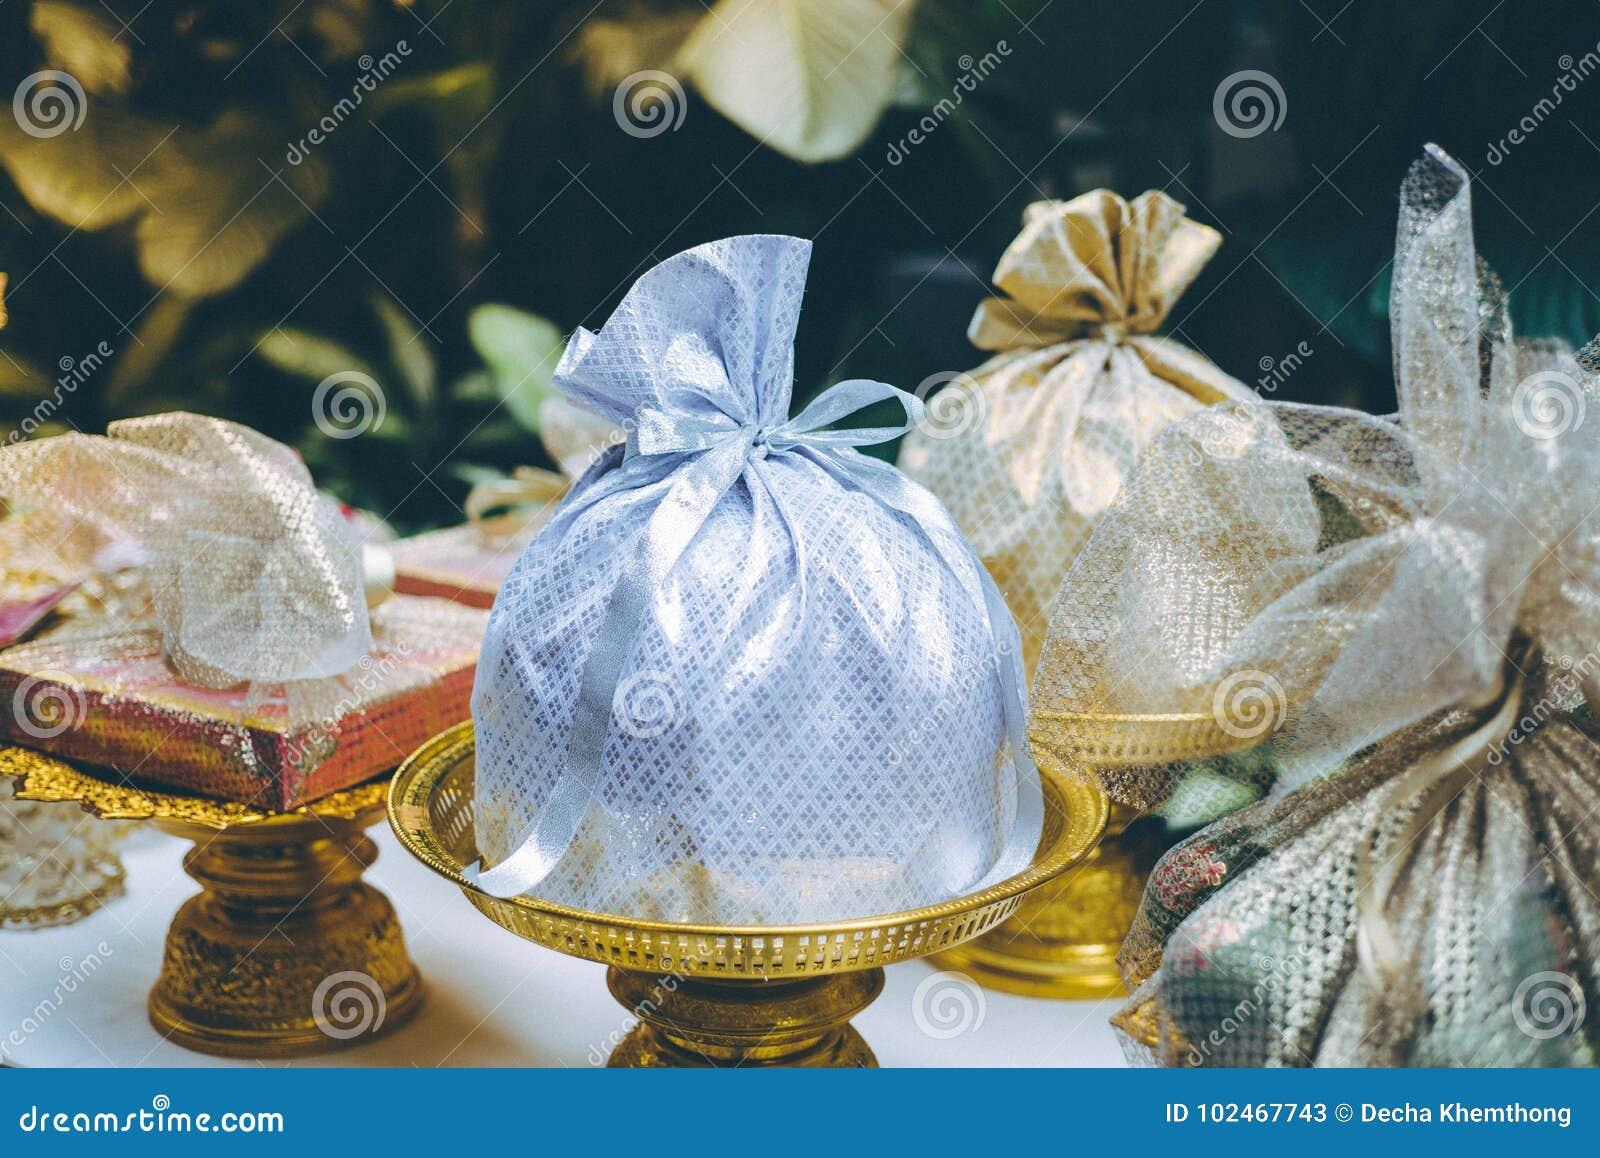 Gift Set For Thai Wedding Caremony Stock Image Image Of Groom